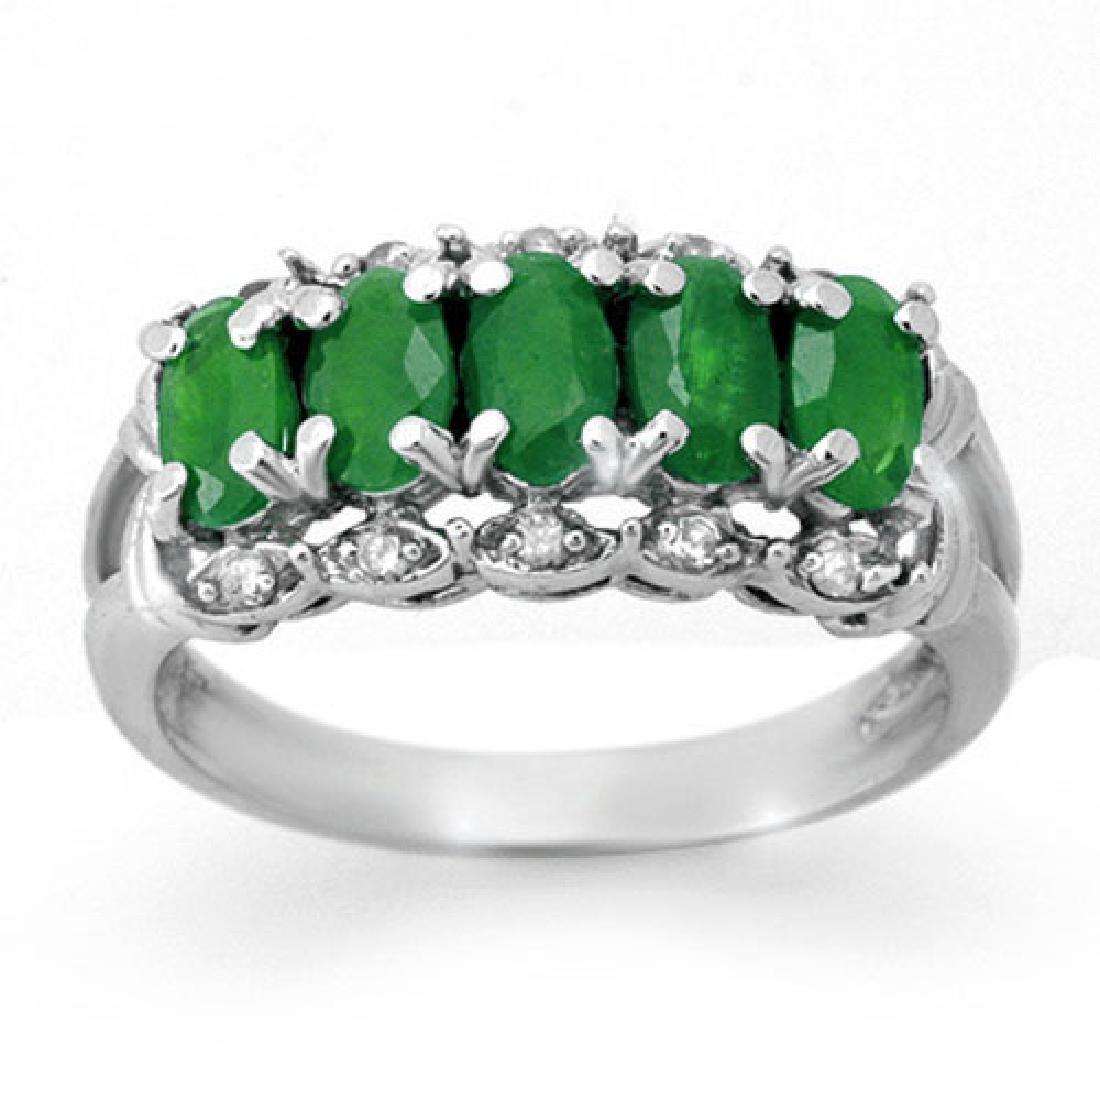 1.75 CTW Emerald & Diamond Ring 10K White Gold